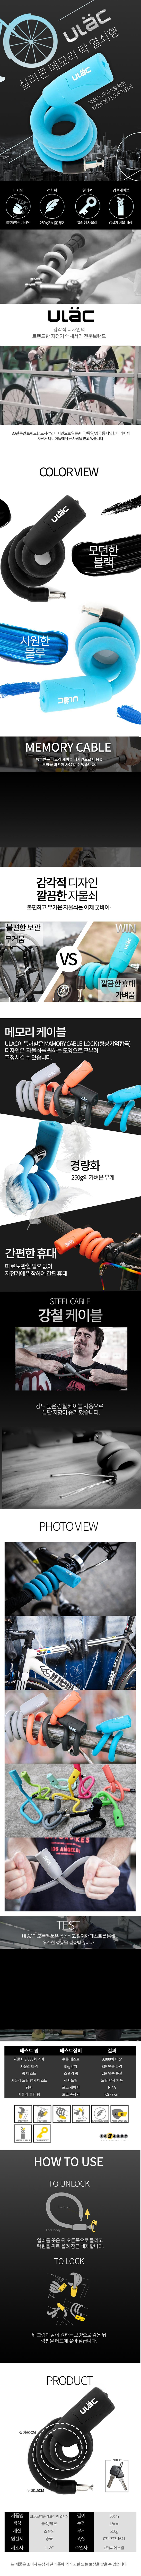 ULac 실리콘메모리락 자전거 자물쇠 (열쇠형 블랙) - 집잇, 12,800원, 자전거 관리용품, 자물쇠